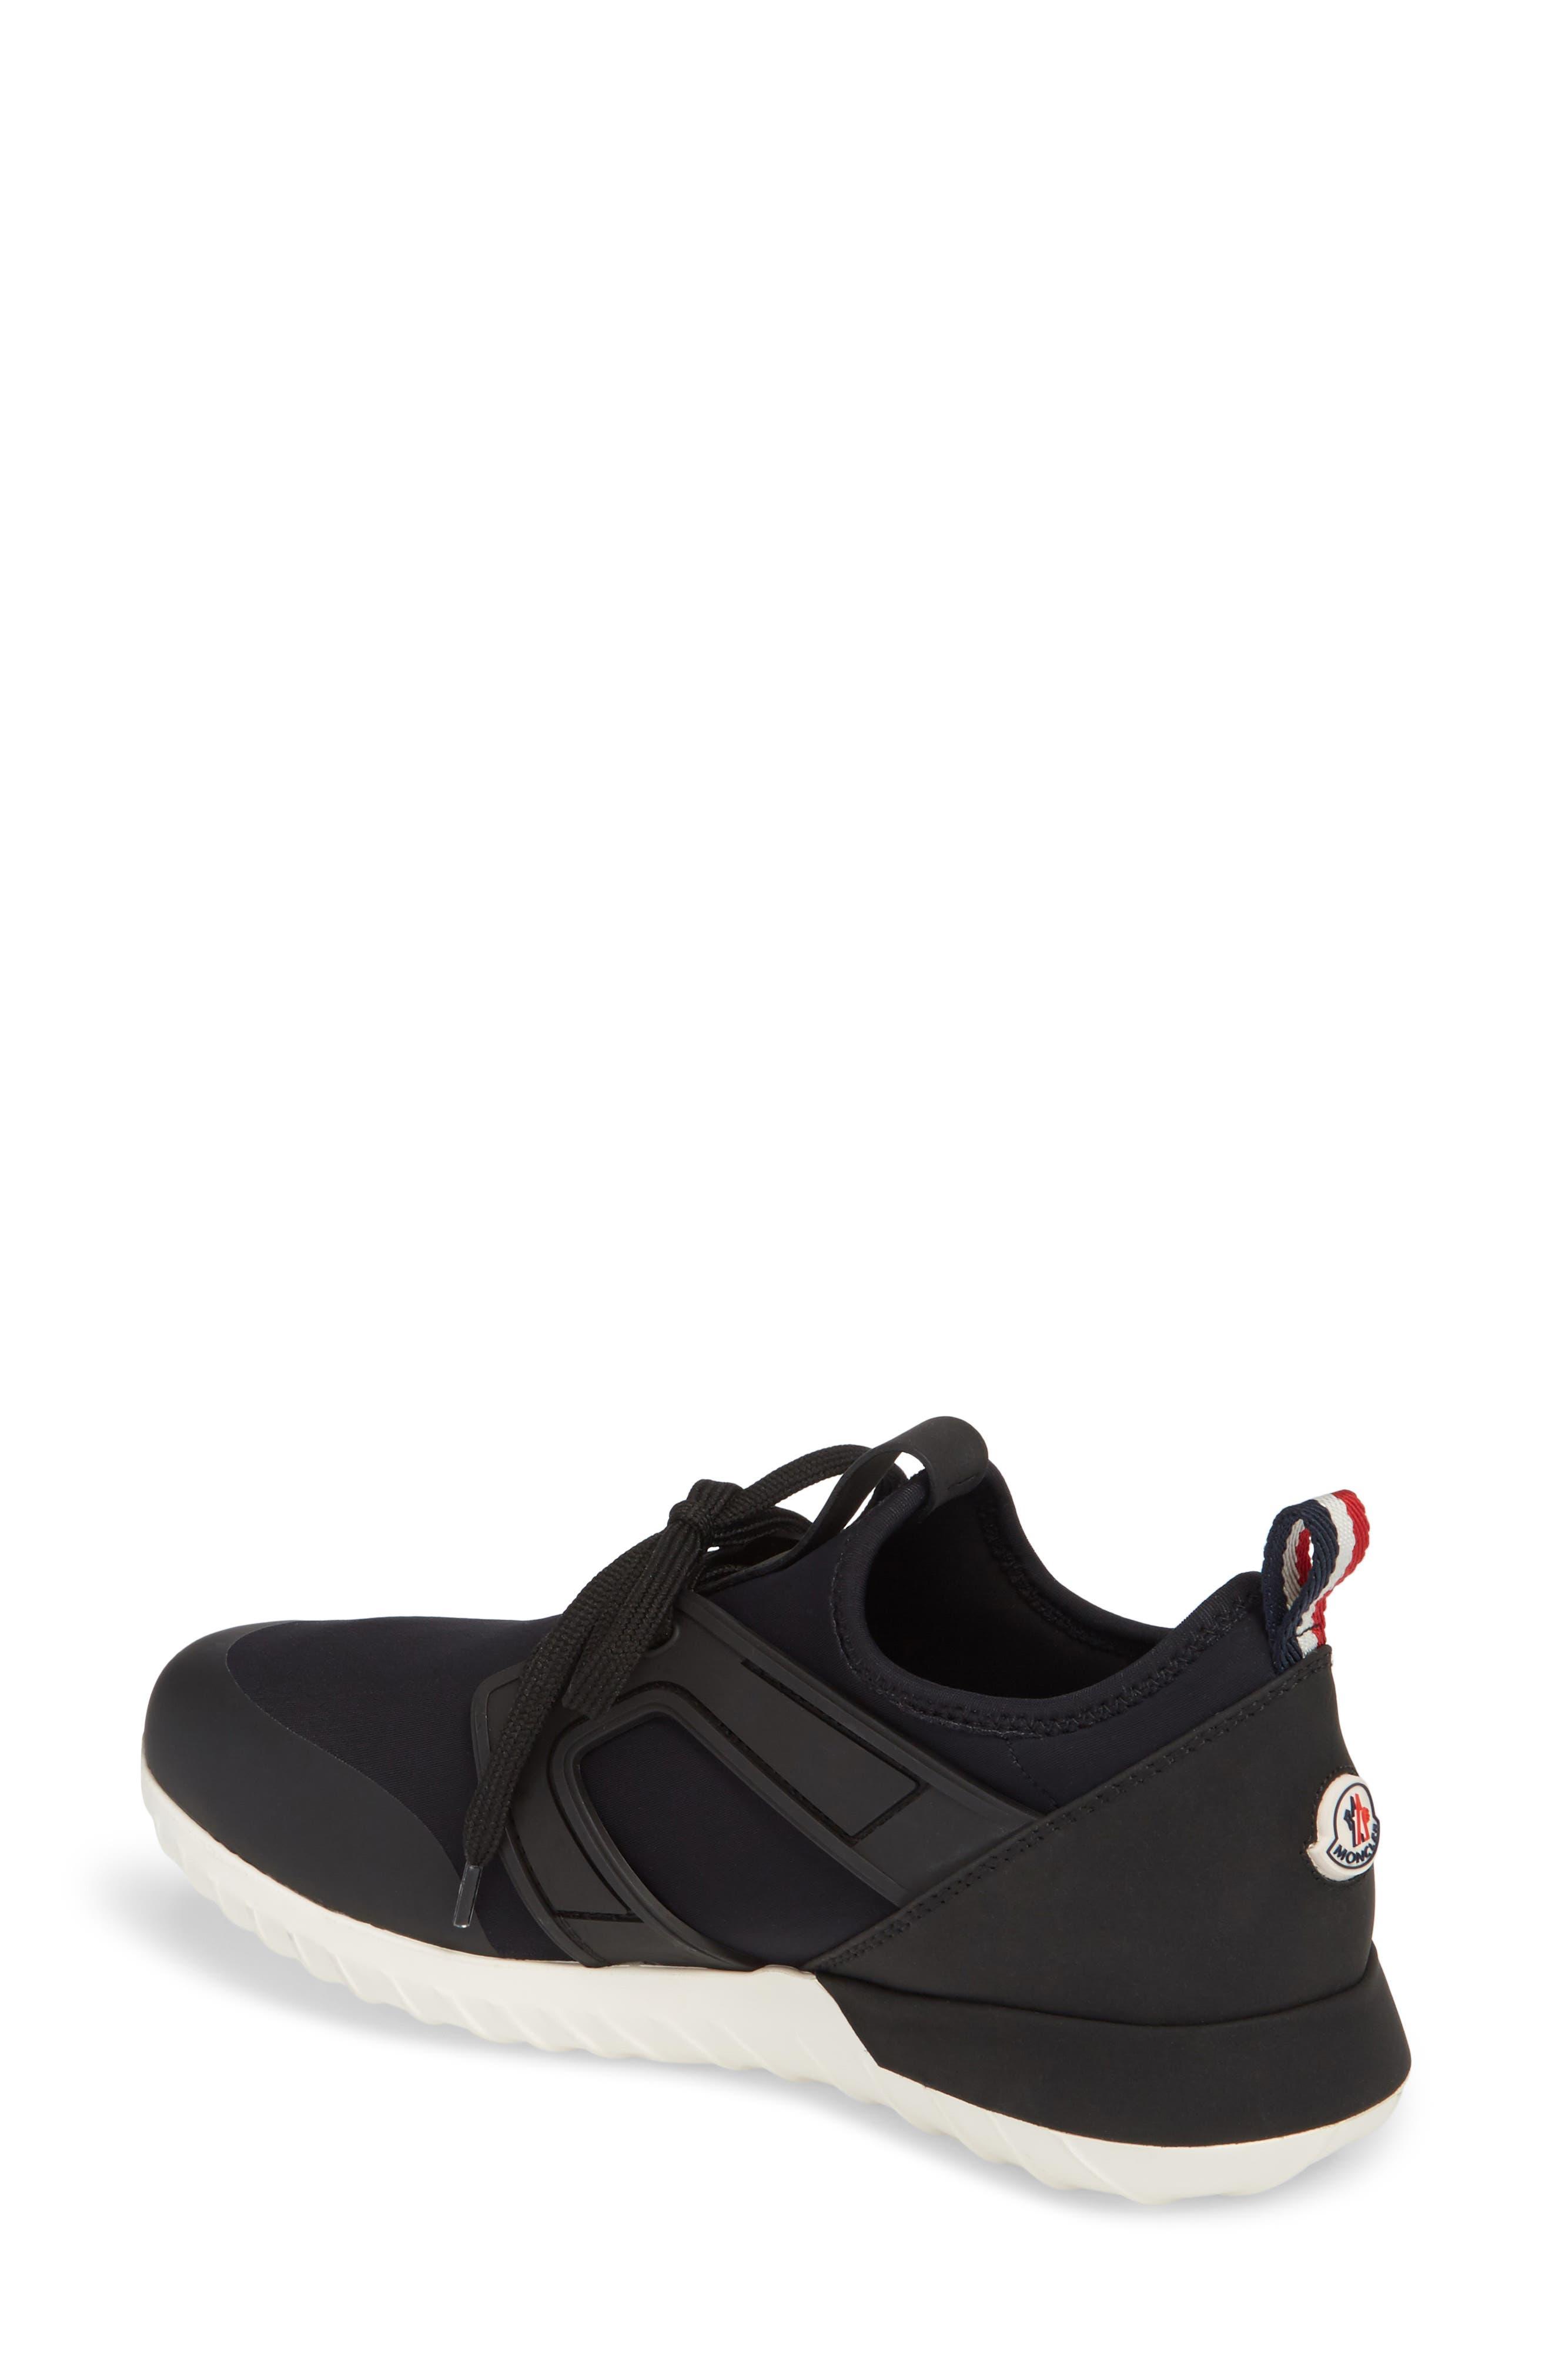 Meline Lace-Up Sneaker,                             Alternate thumbnail 2, color,                             001